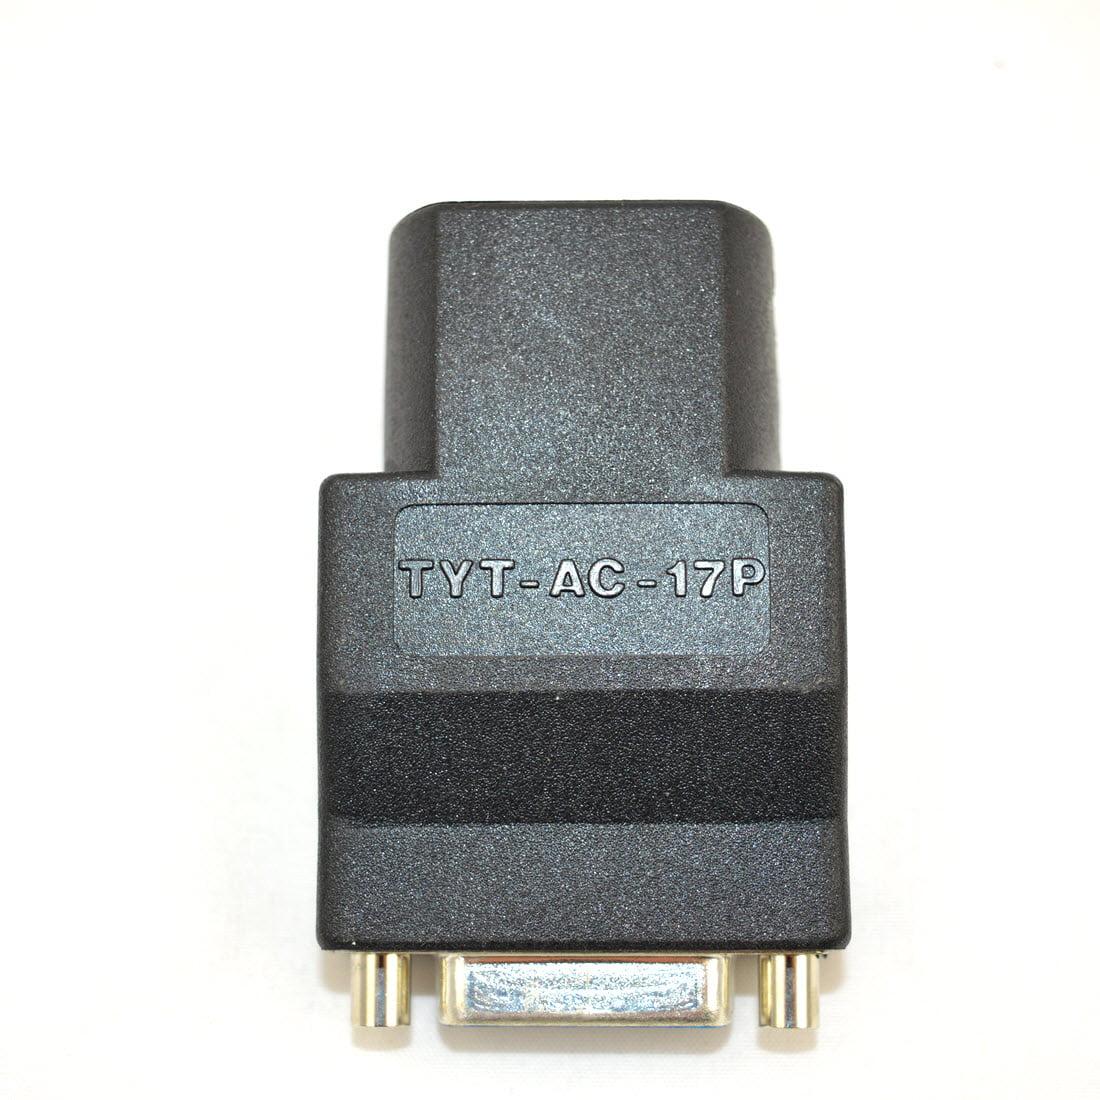 Autoland-toyota-pre-16-pin-connector